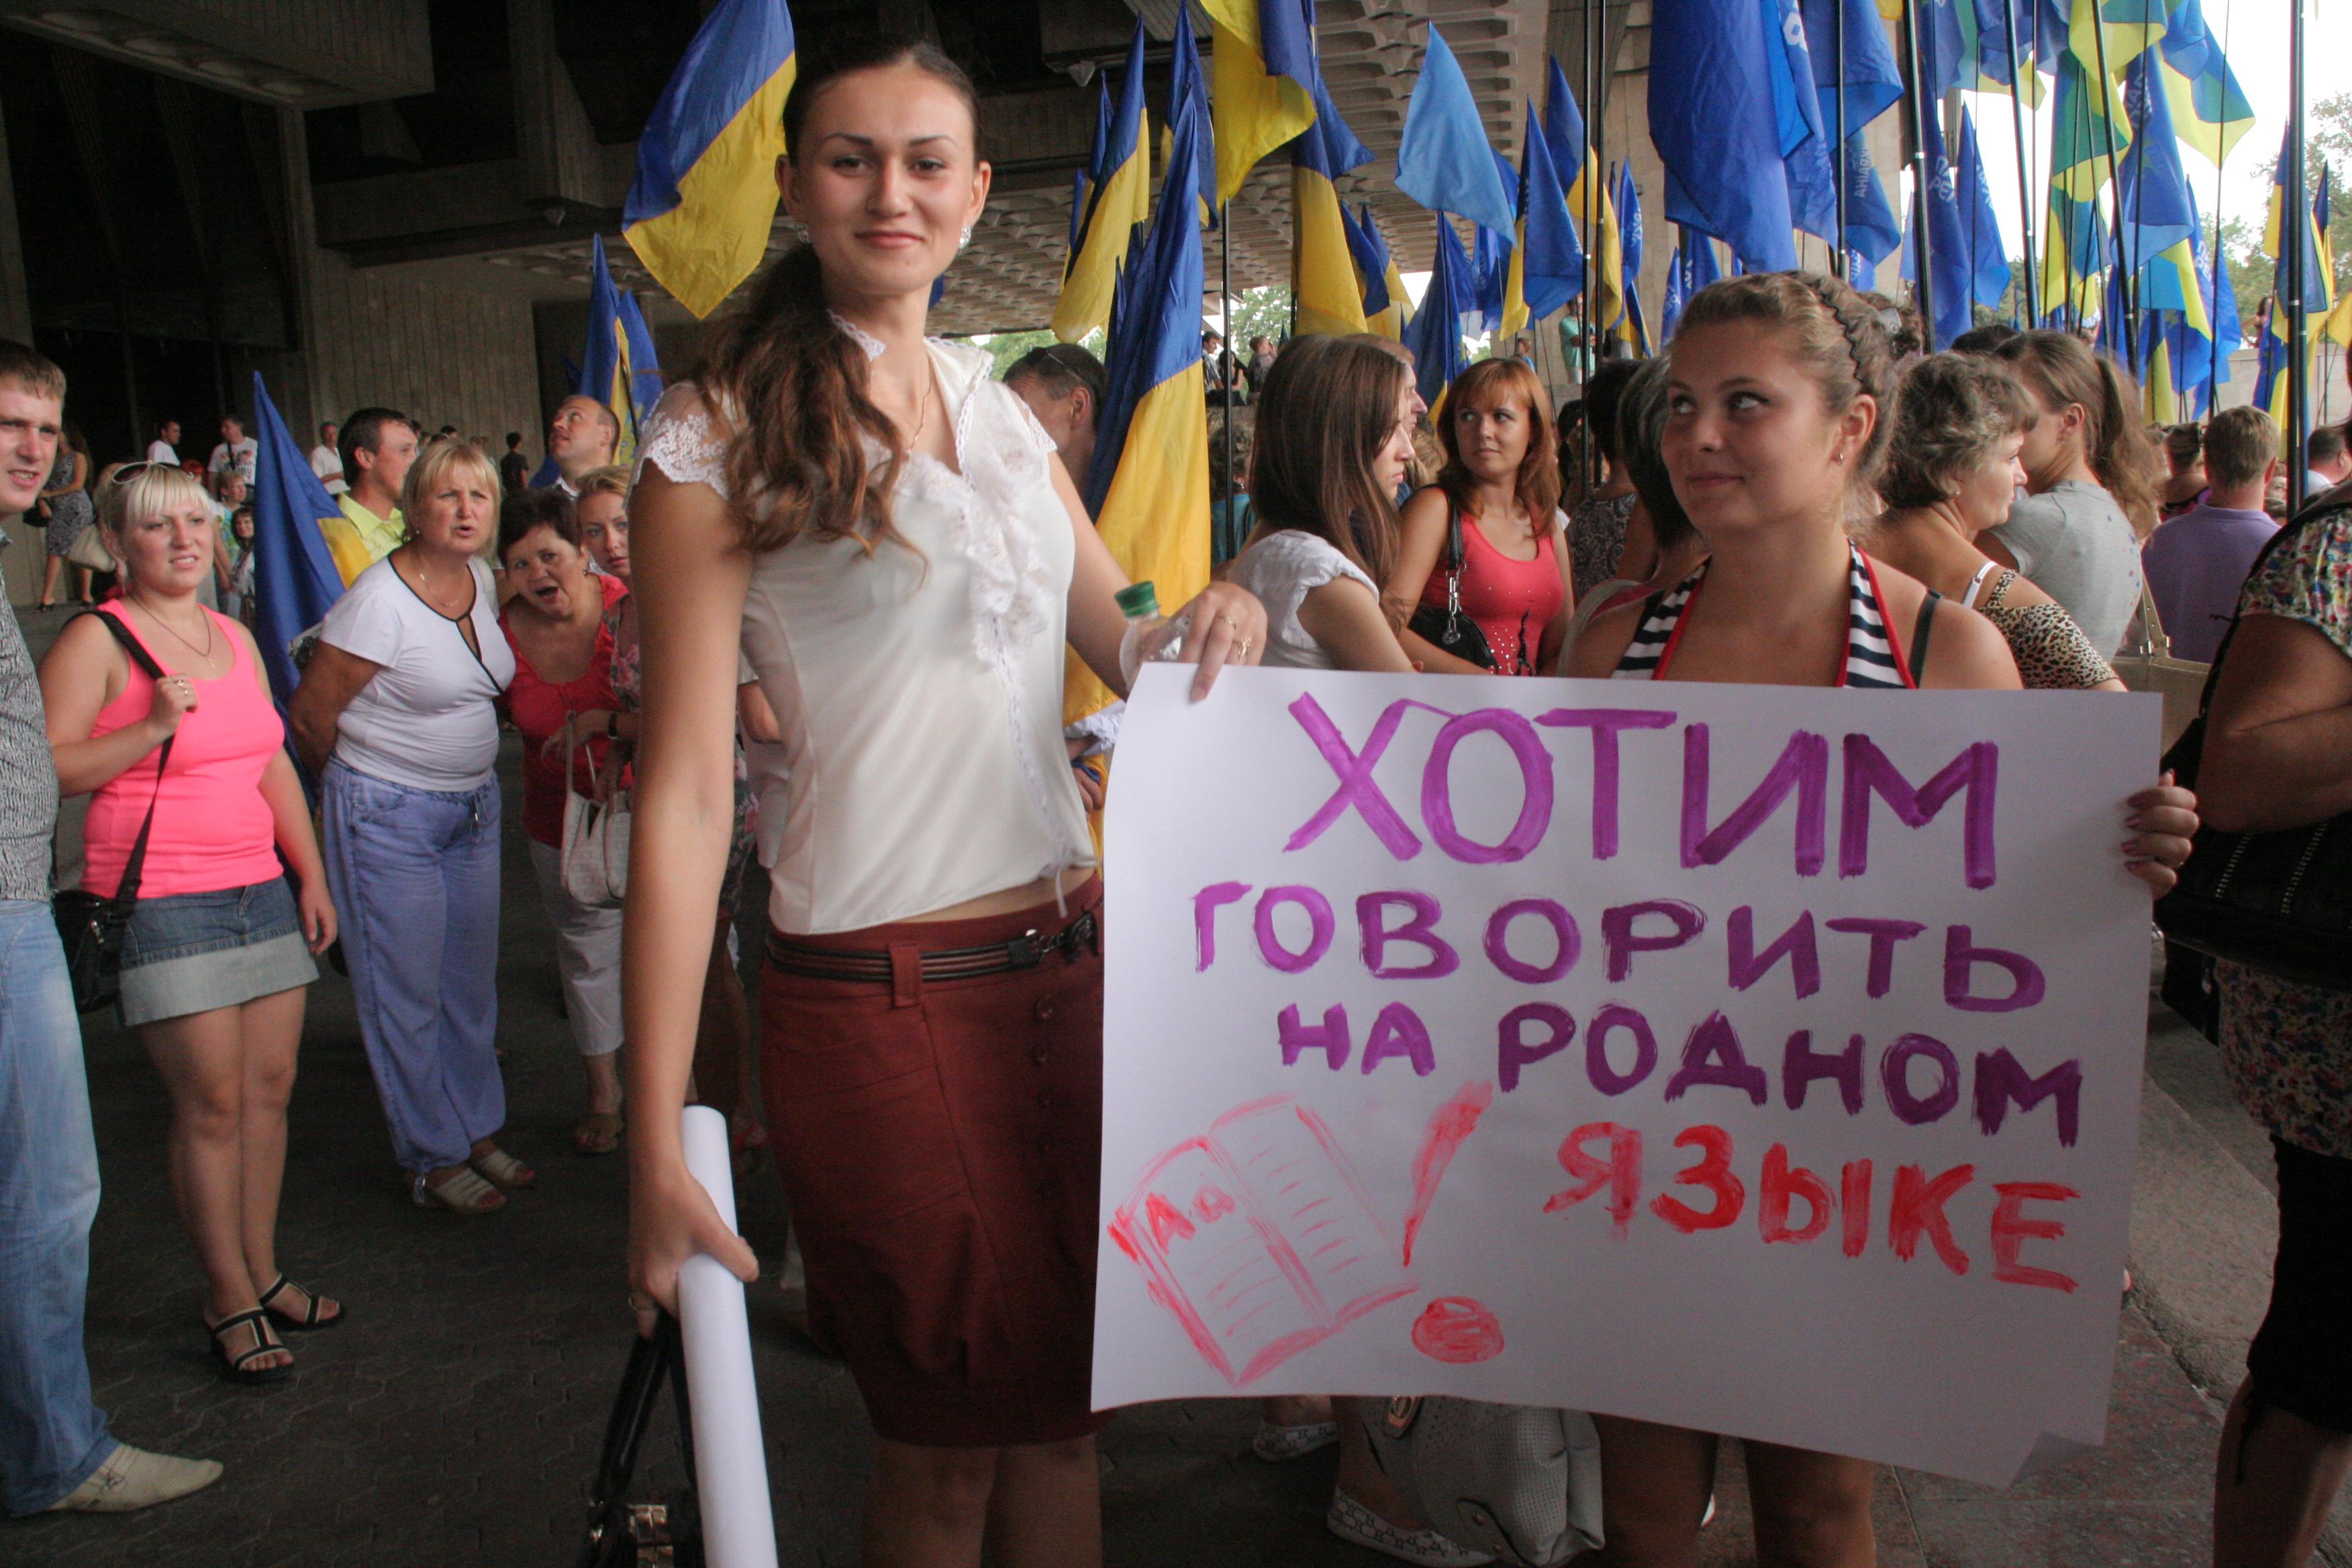 https://news2.ru/user_images/185334/488733_1457852177.jpg